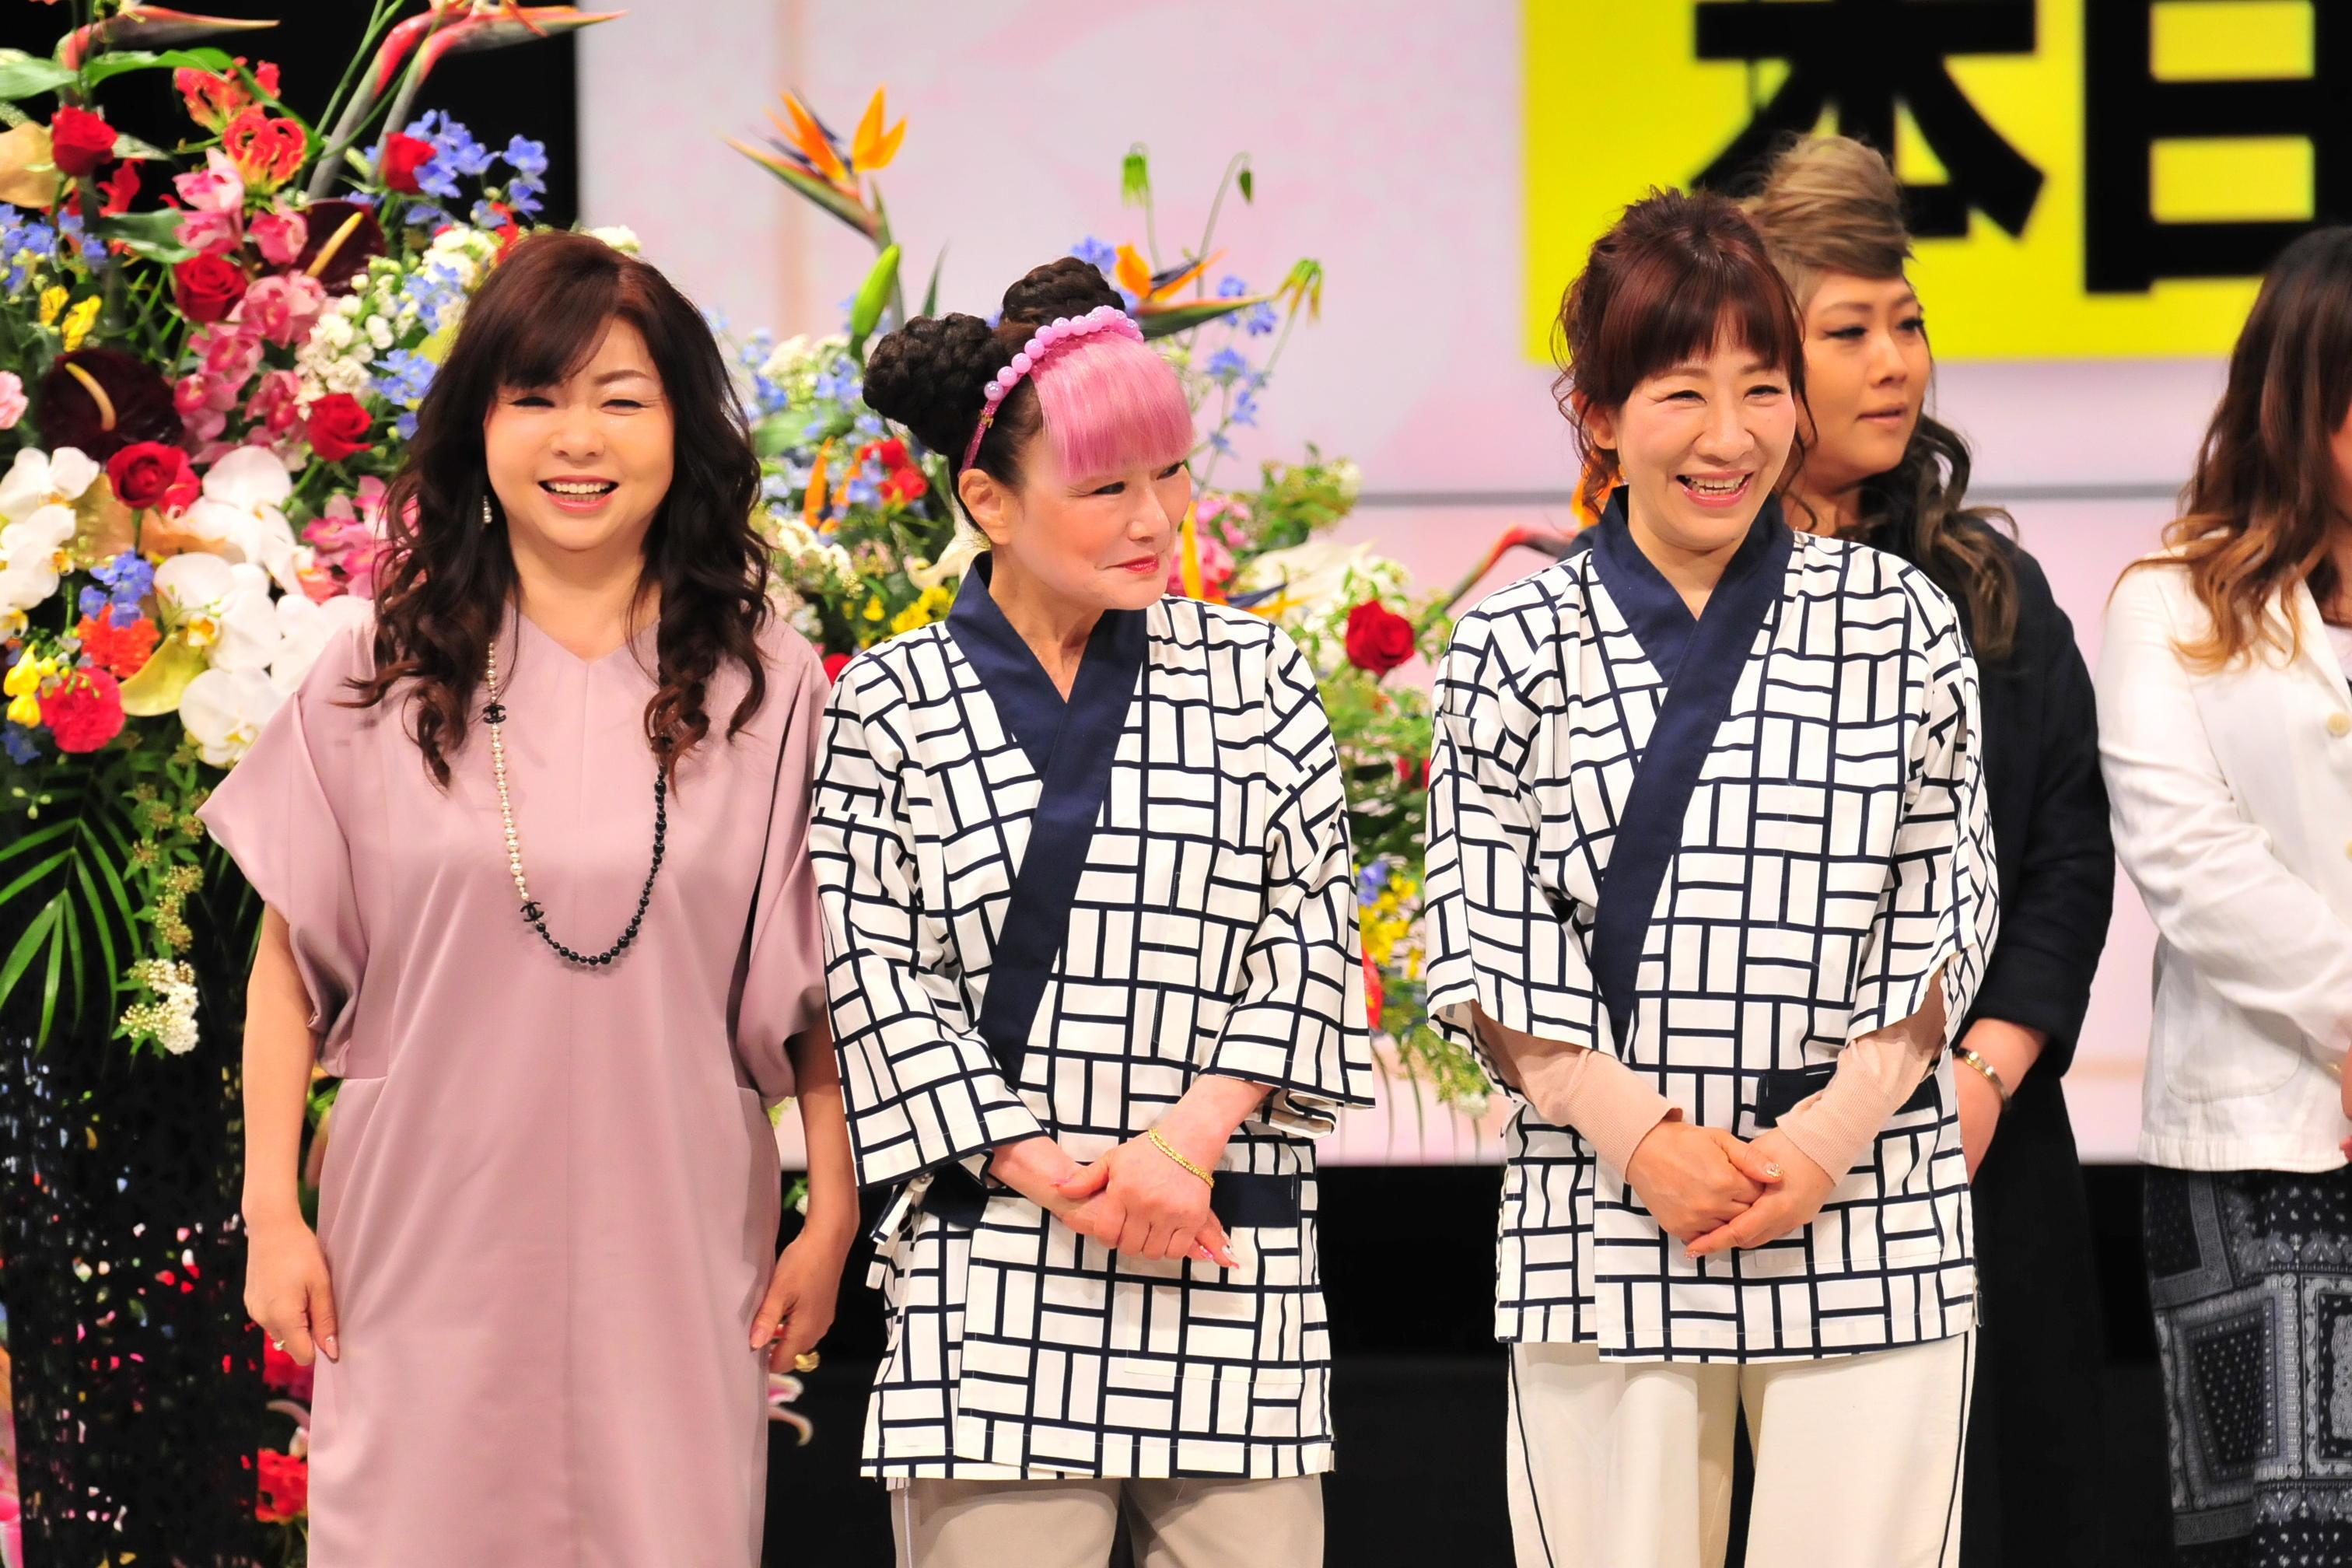 http://news.yoshimoto.co.jp/20170425155833-d3279146211aa280a8fbe97dcc3794377bc8871d.jpg